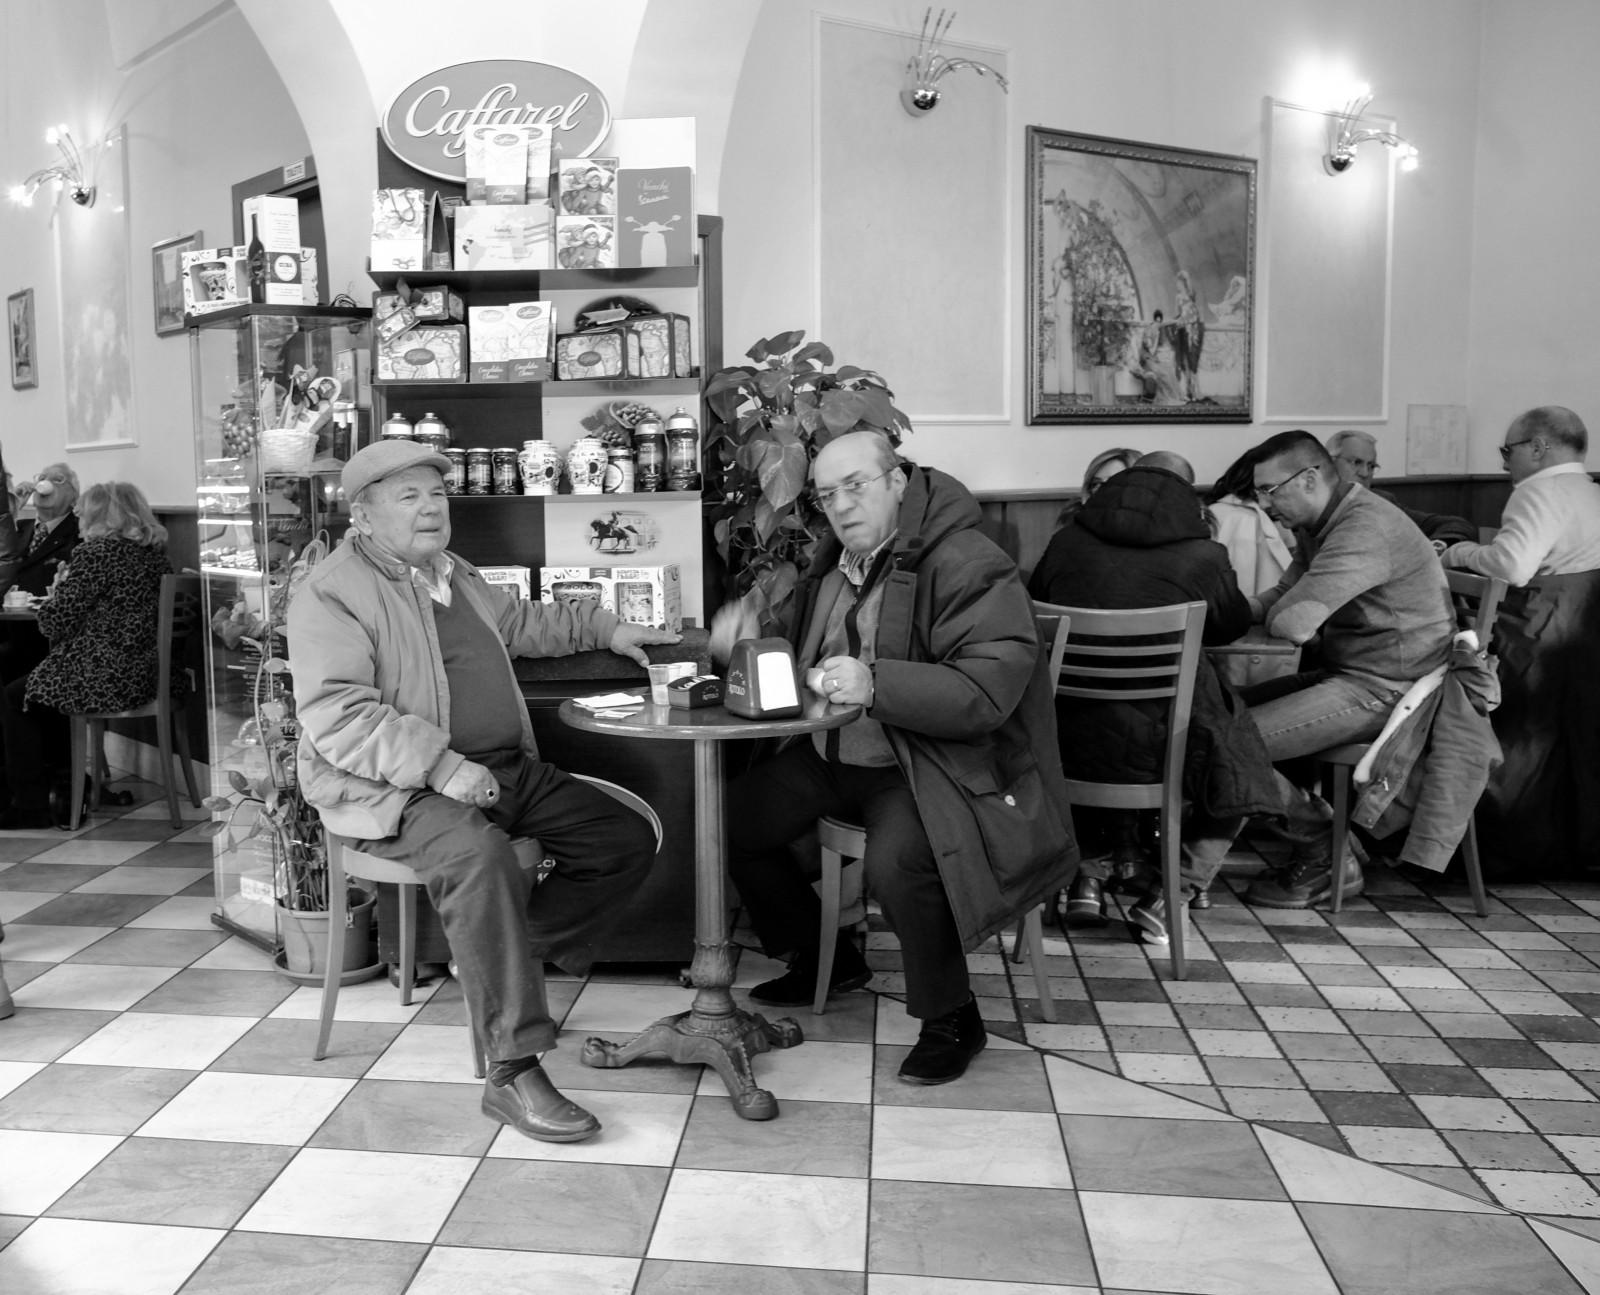 hintergrundbilder schwarz einfarbig stra e italien fotografie kaffee restaurant kultur. Black Bedroom Furniture Sets. Home Design Ideas